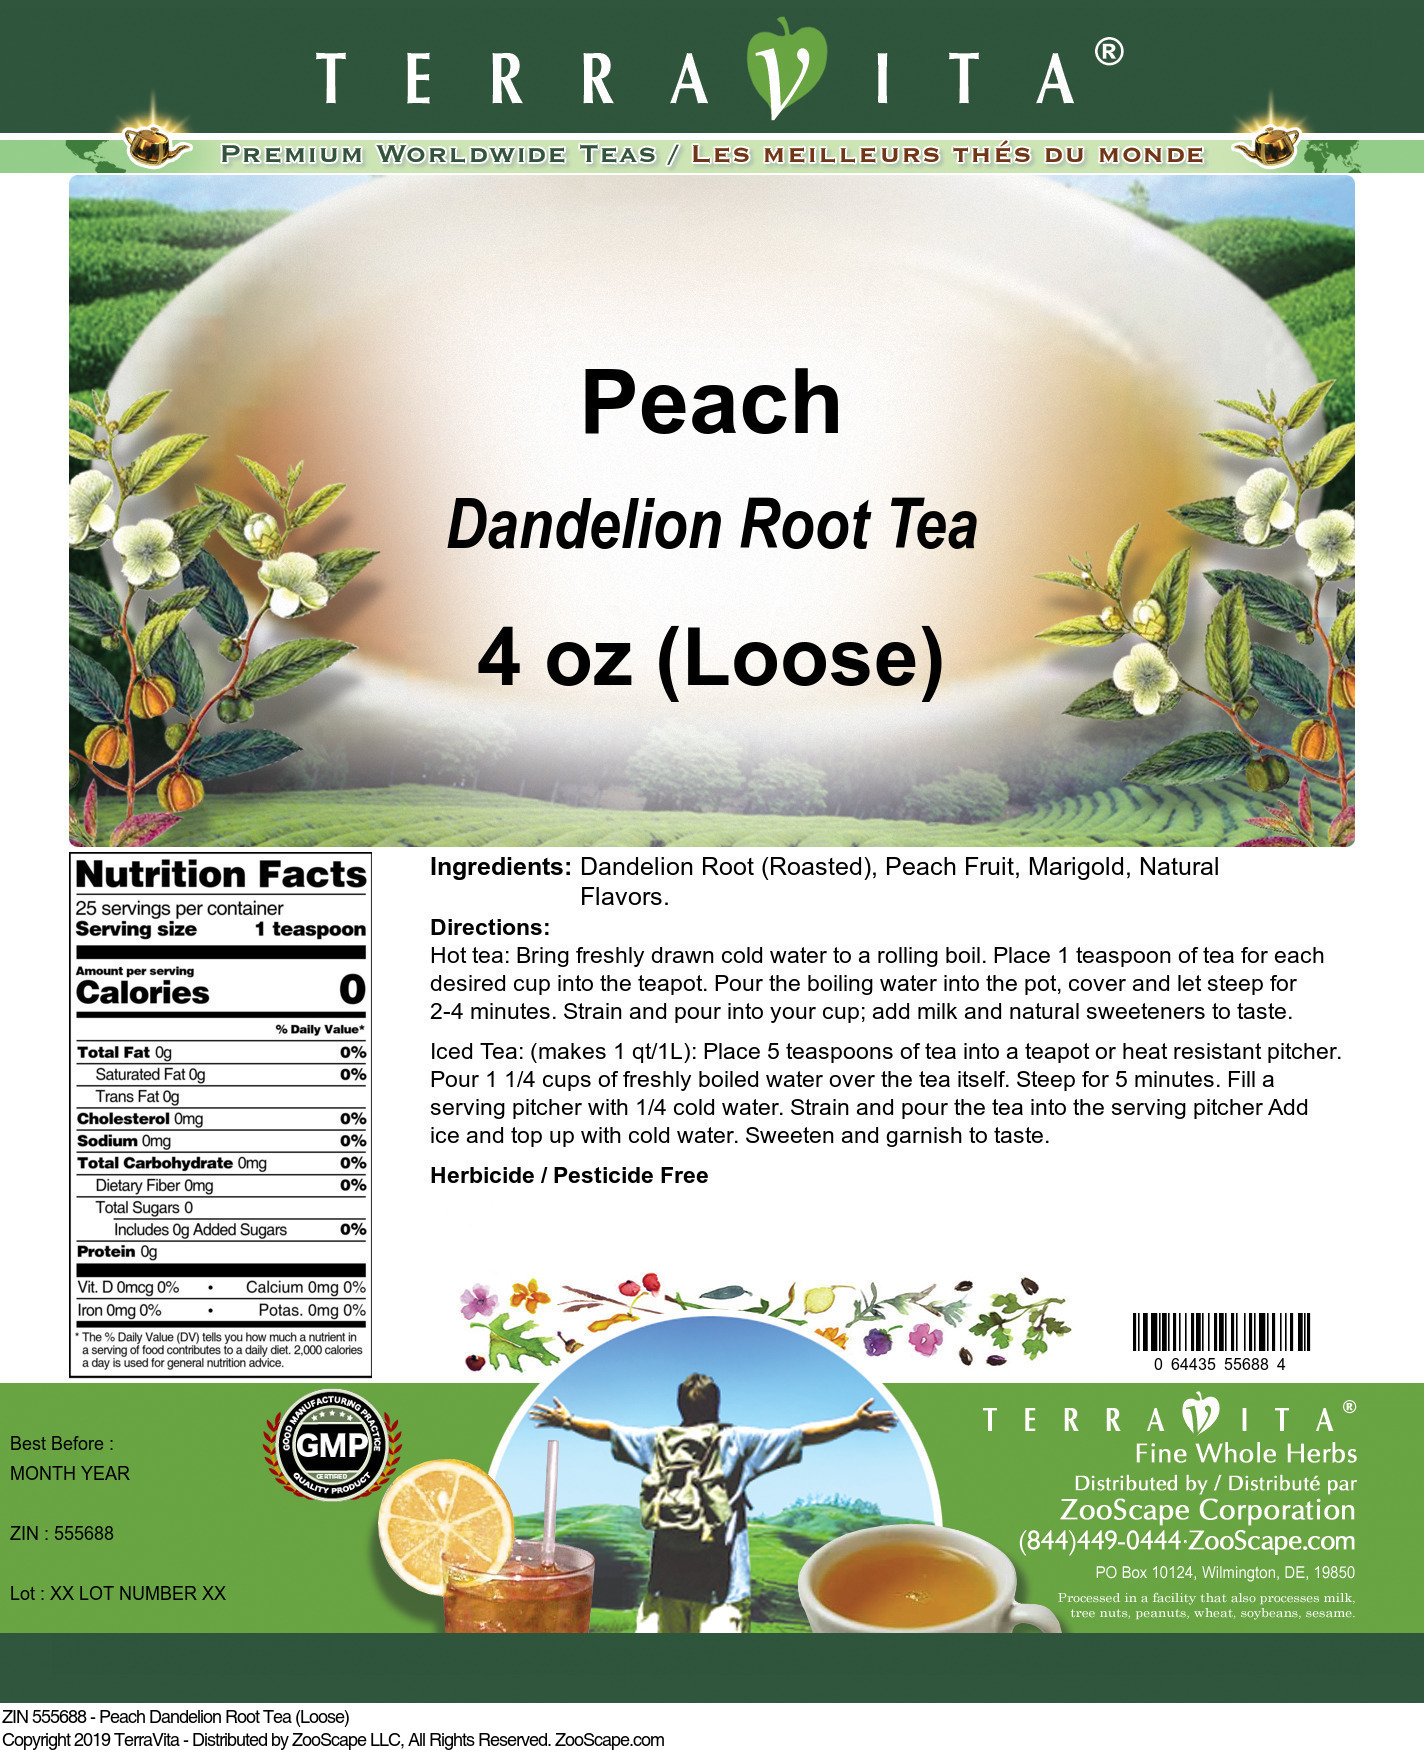 Peach Dandelion Root